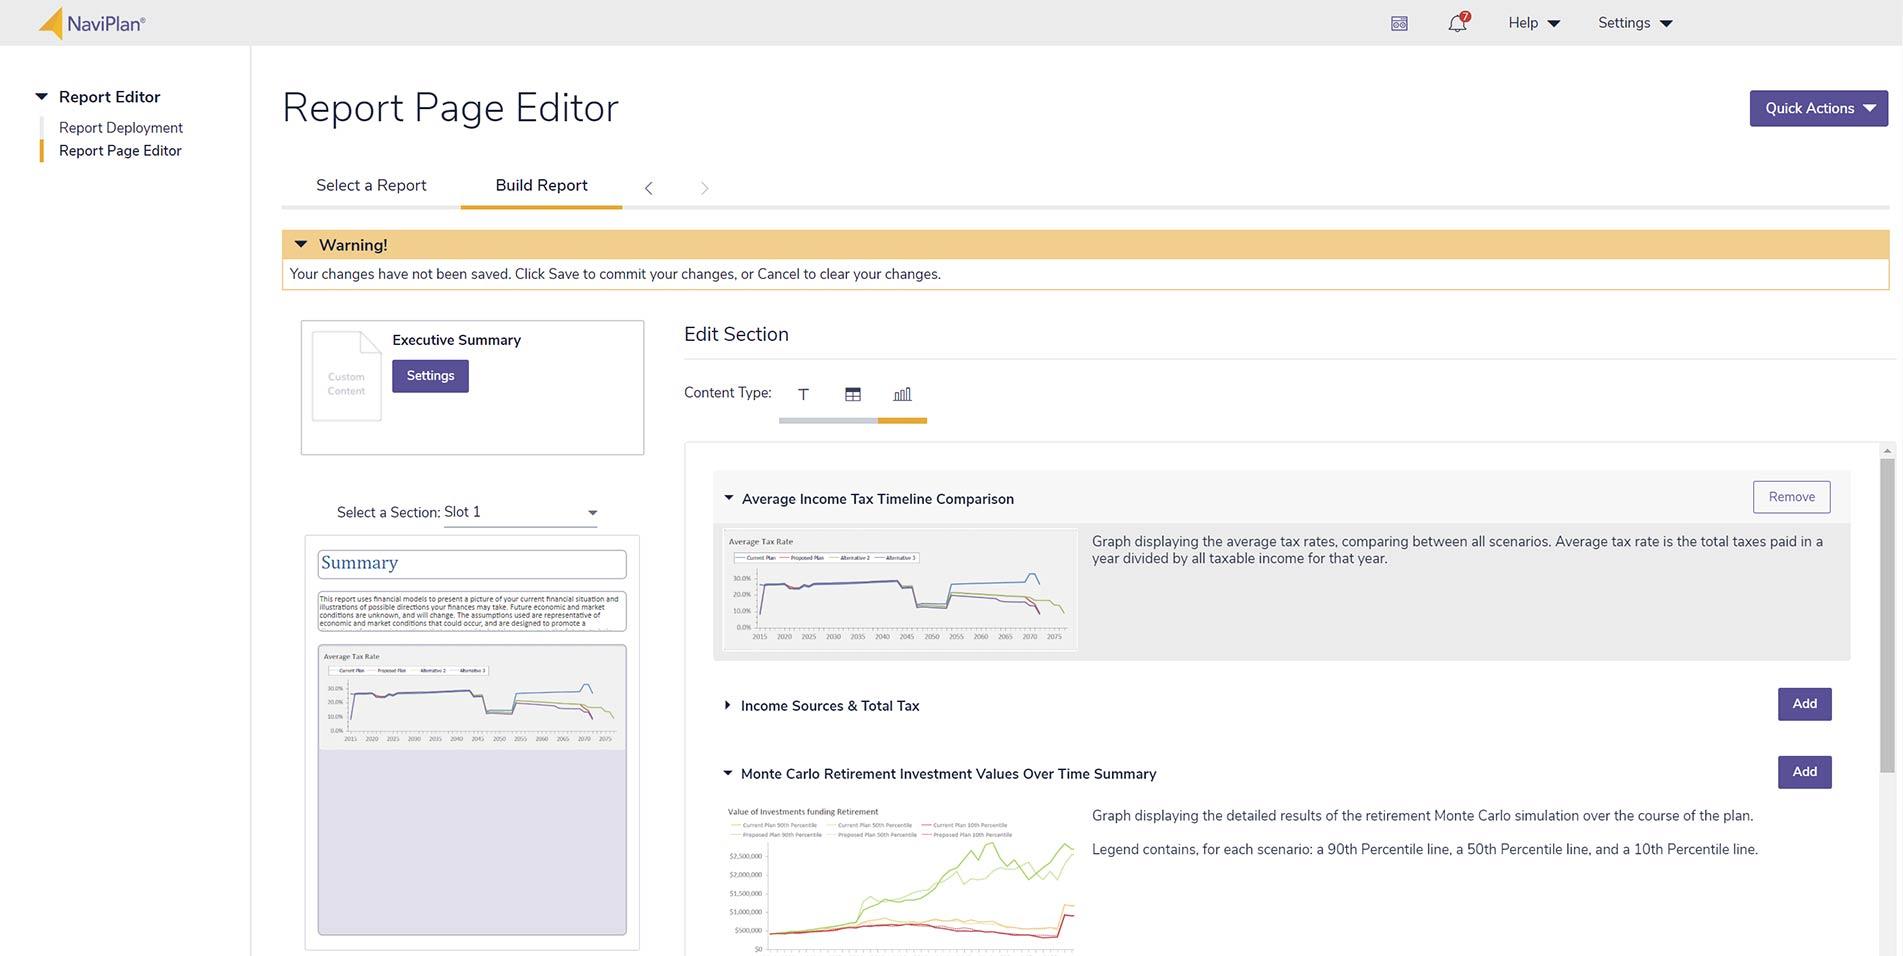 NaviPlan Client Report Editor